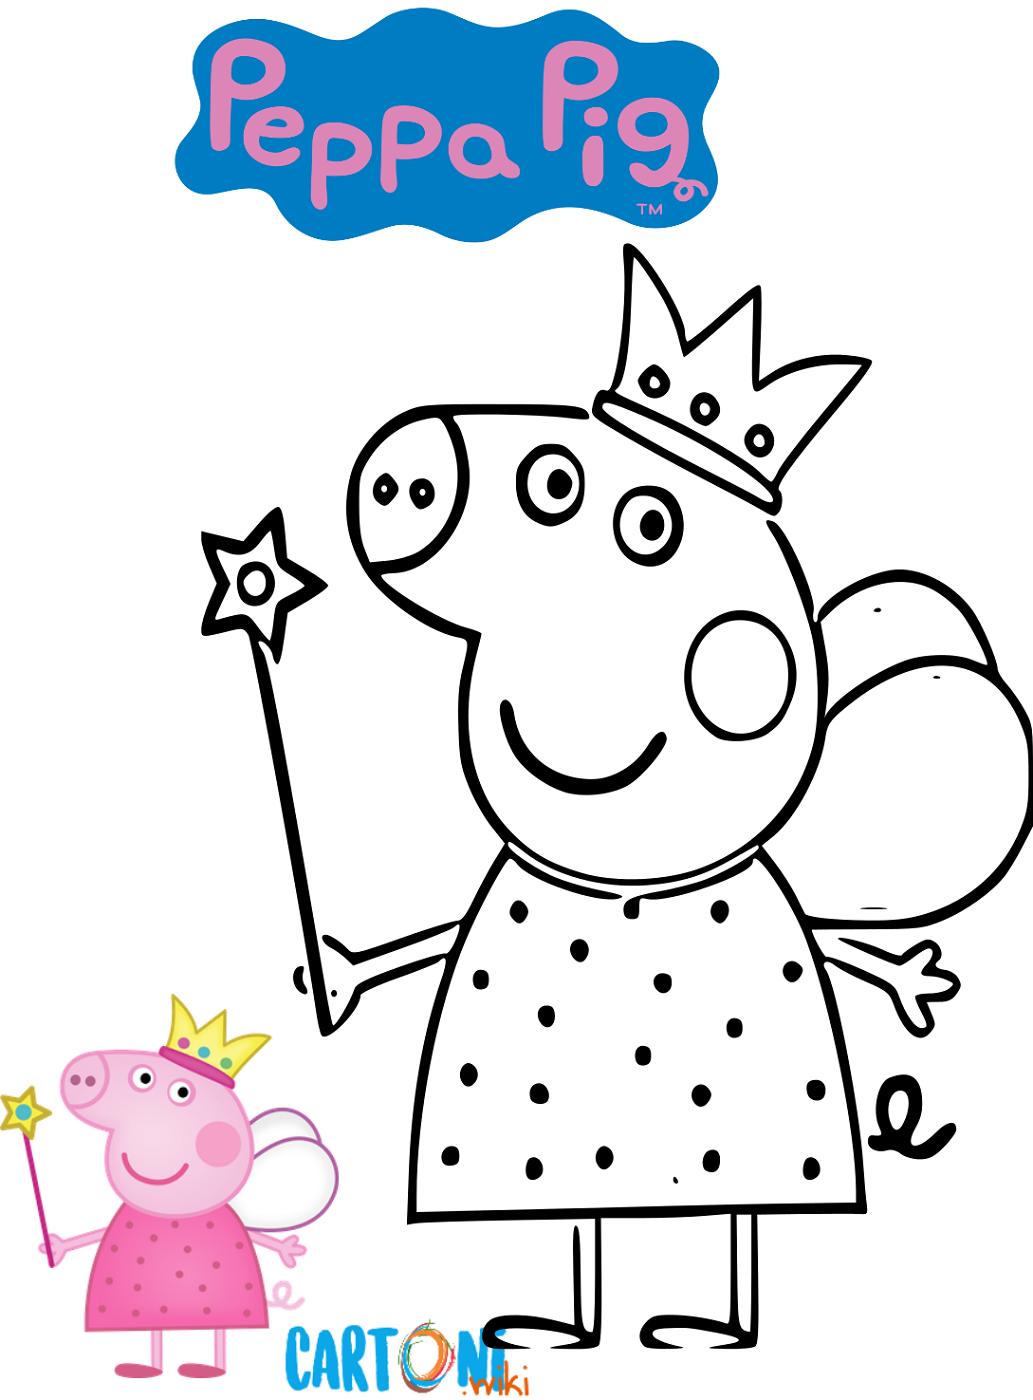 Colora peppa pig fatina cartoni animati for Maschere di peppa pig da colorare